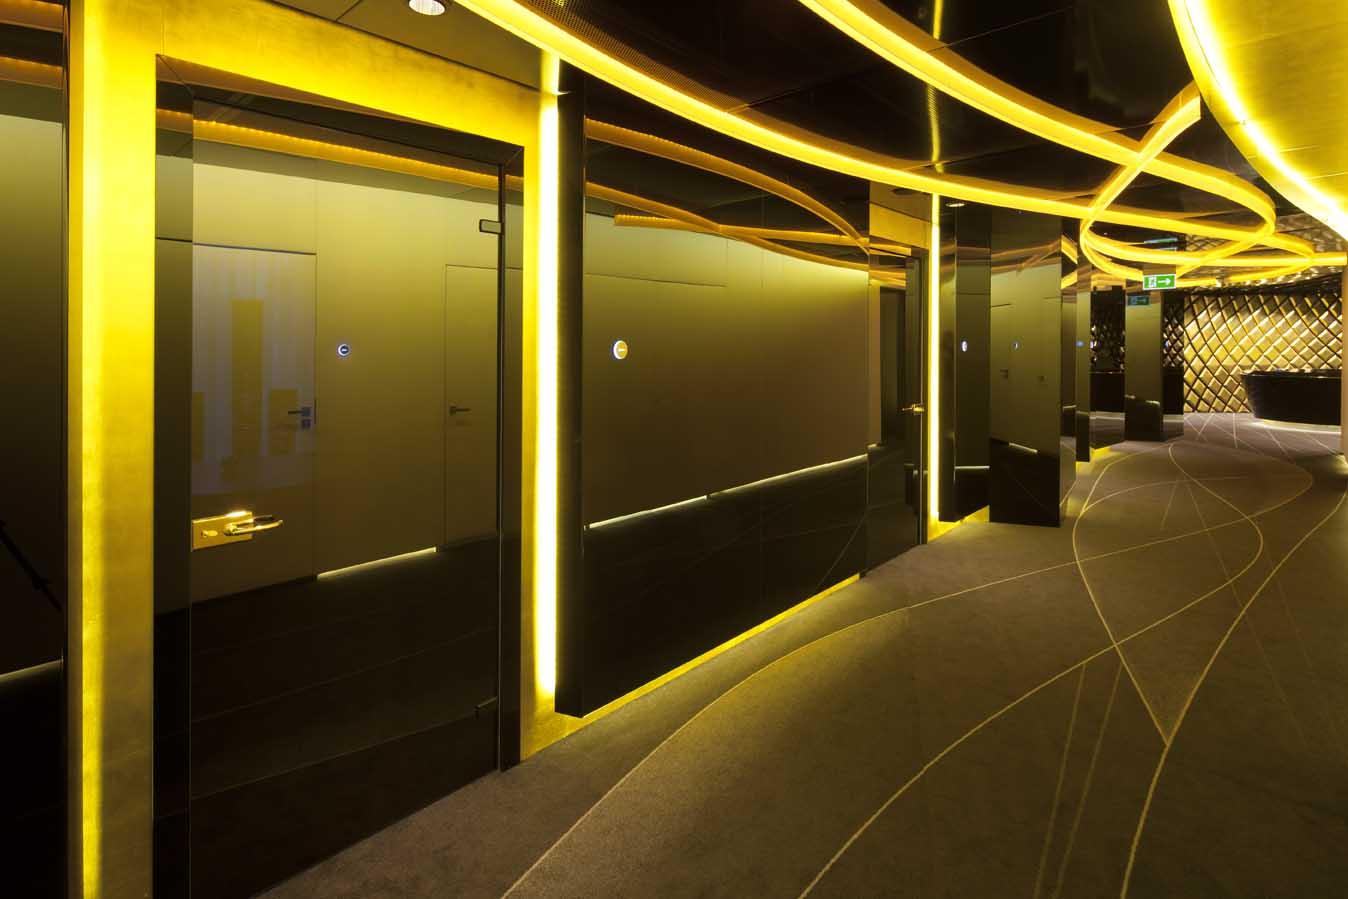 light architecture pko bank polski. Black Bedroom Furniture Sets. Home Design Ideas